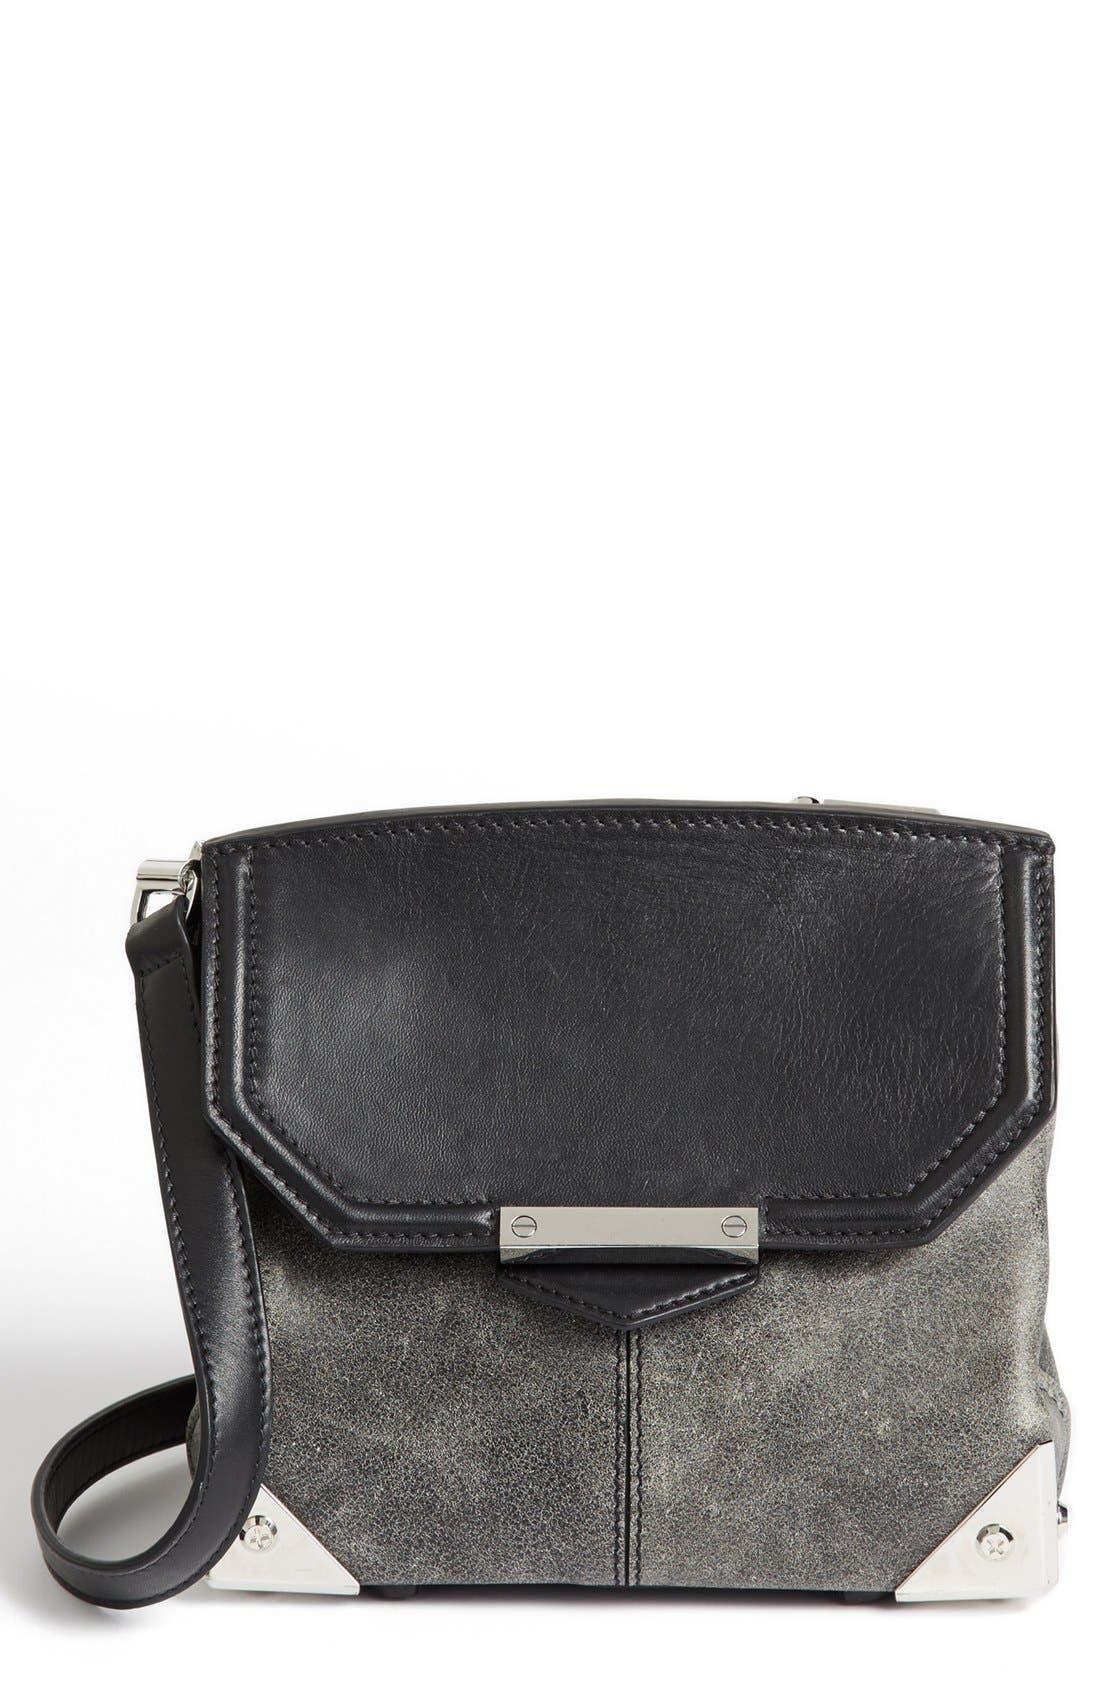 Main Image - Alexander Wang 'Marion' Distressed Leather Crossbody Bag